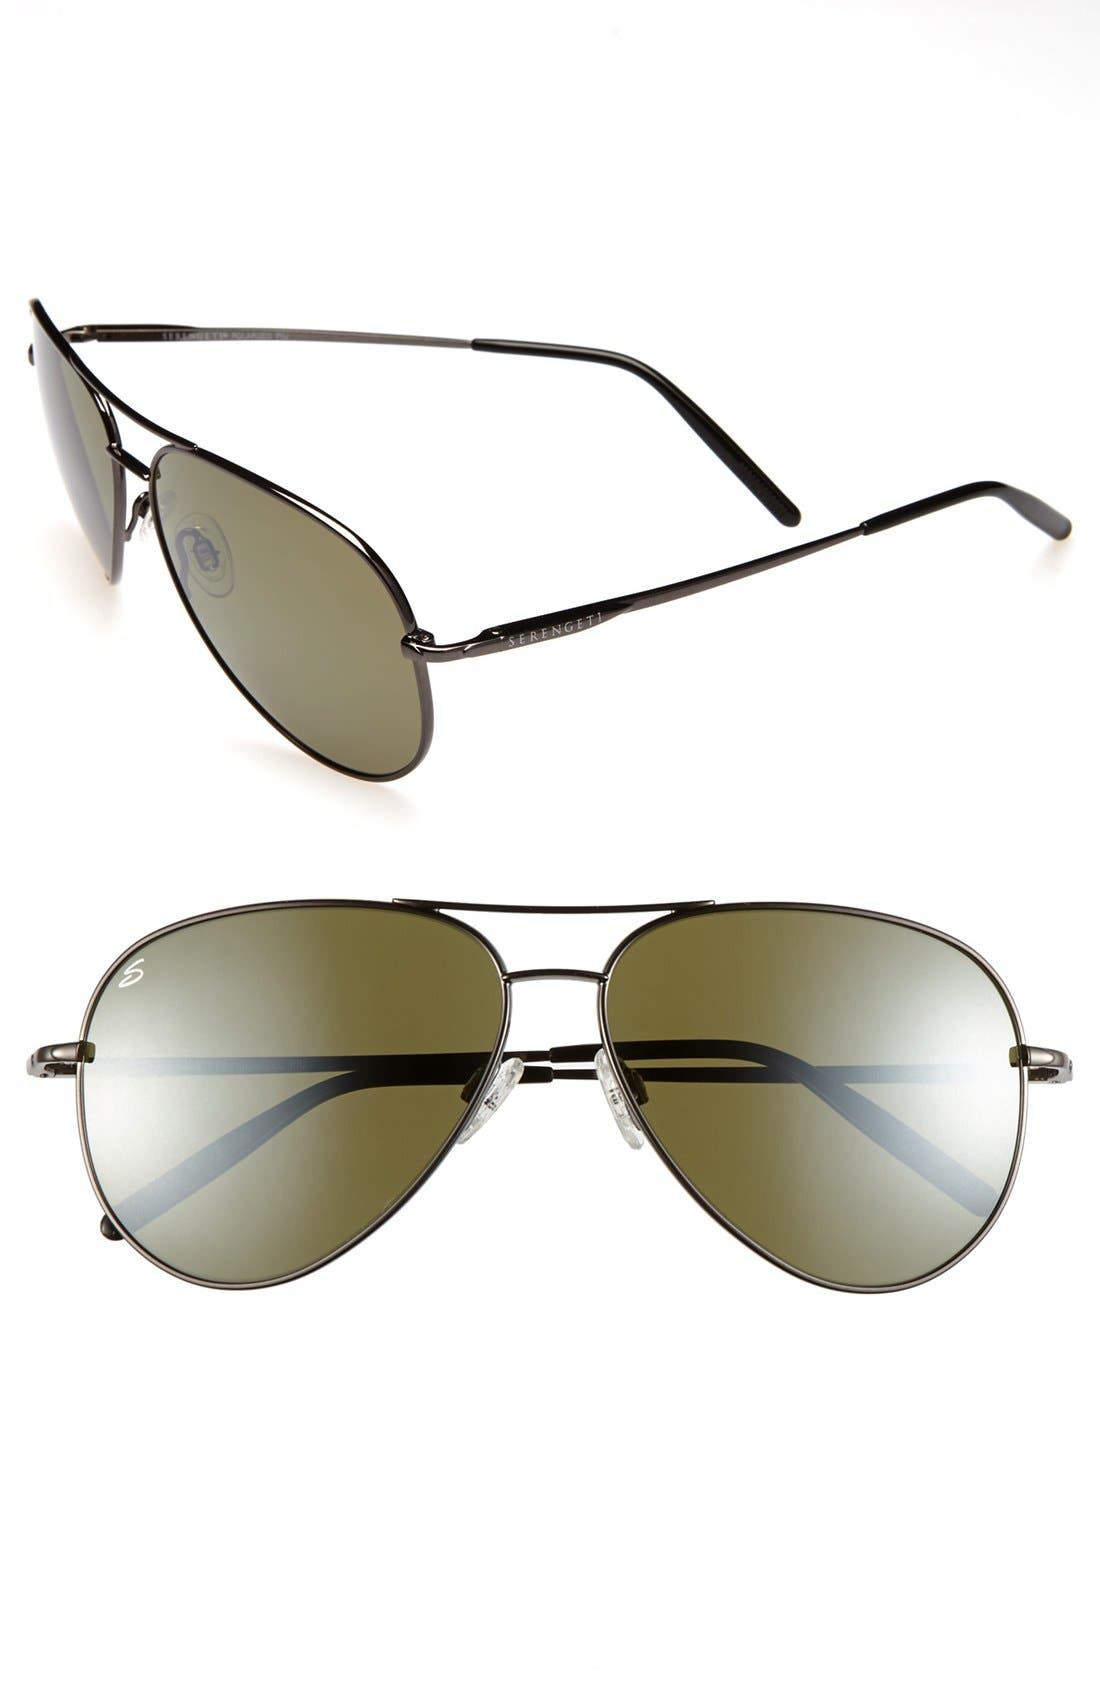 Main Image - Serengeti 'Medium Aviator' 67mm Polarized Sunglasses